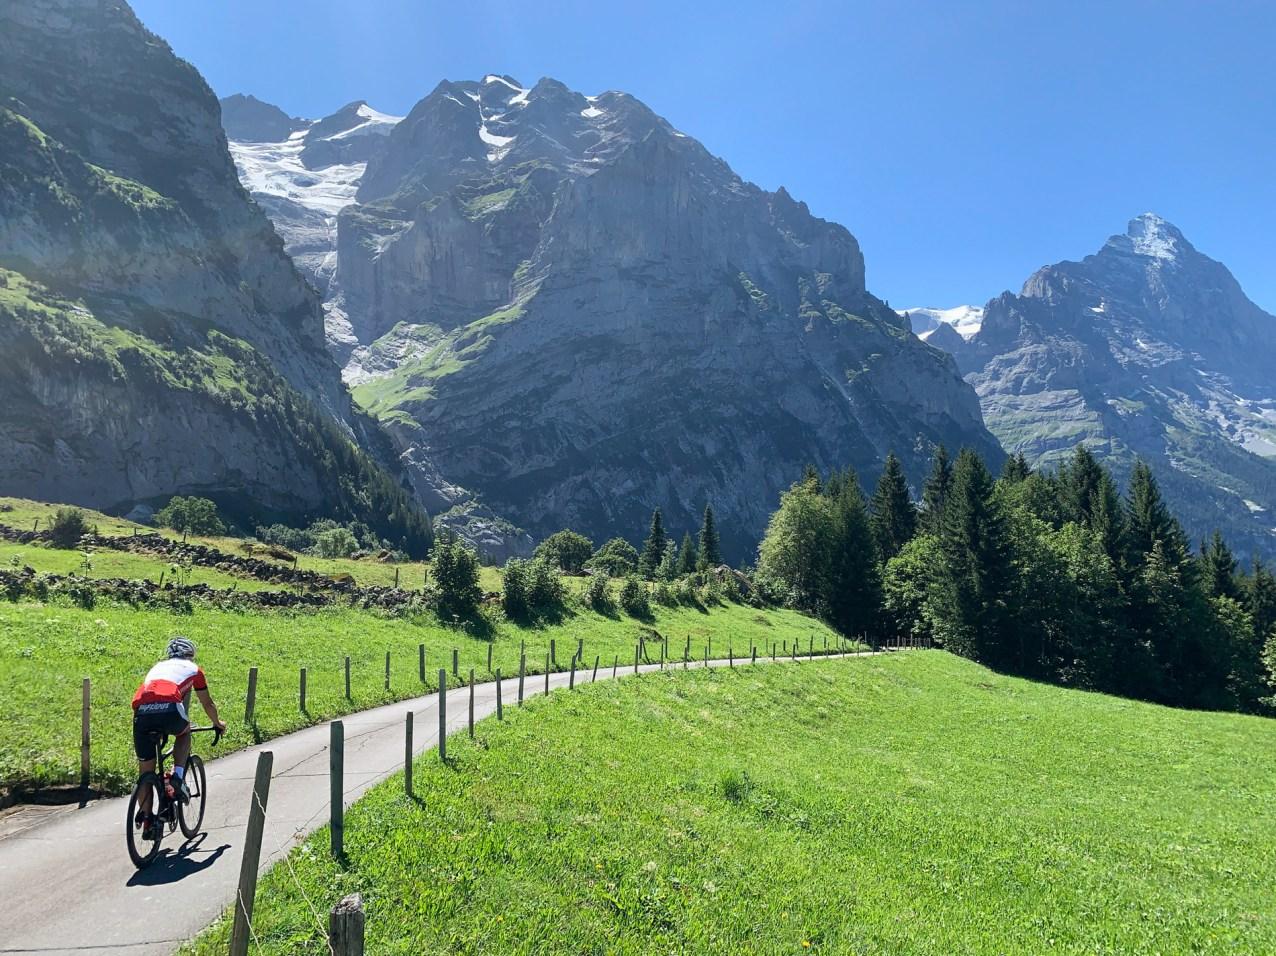 Exhilarating downhill into Grindelwald